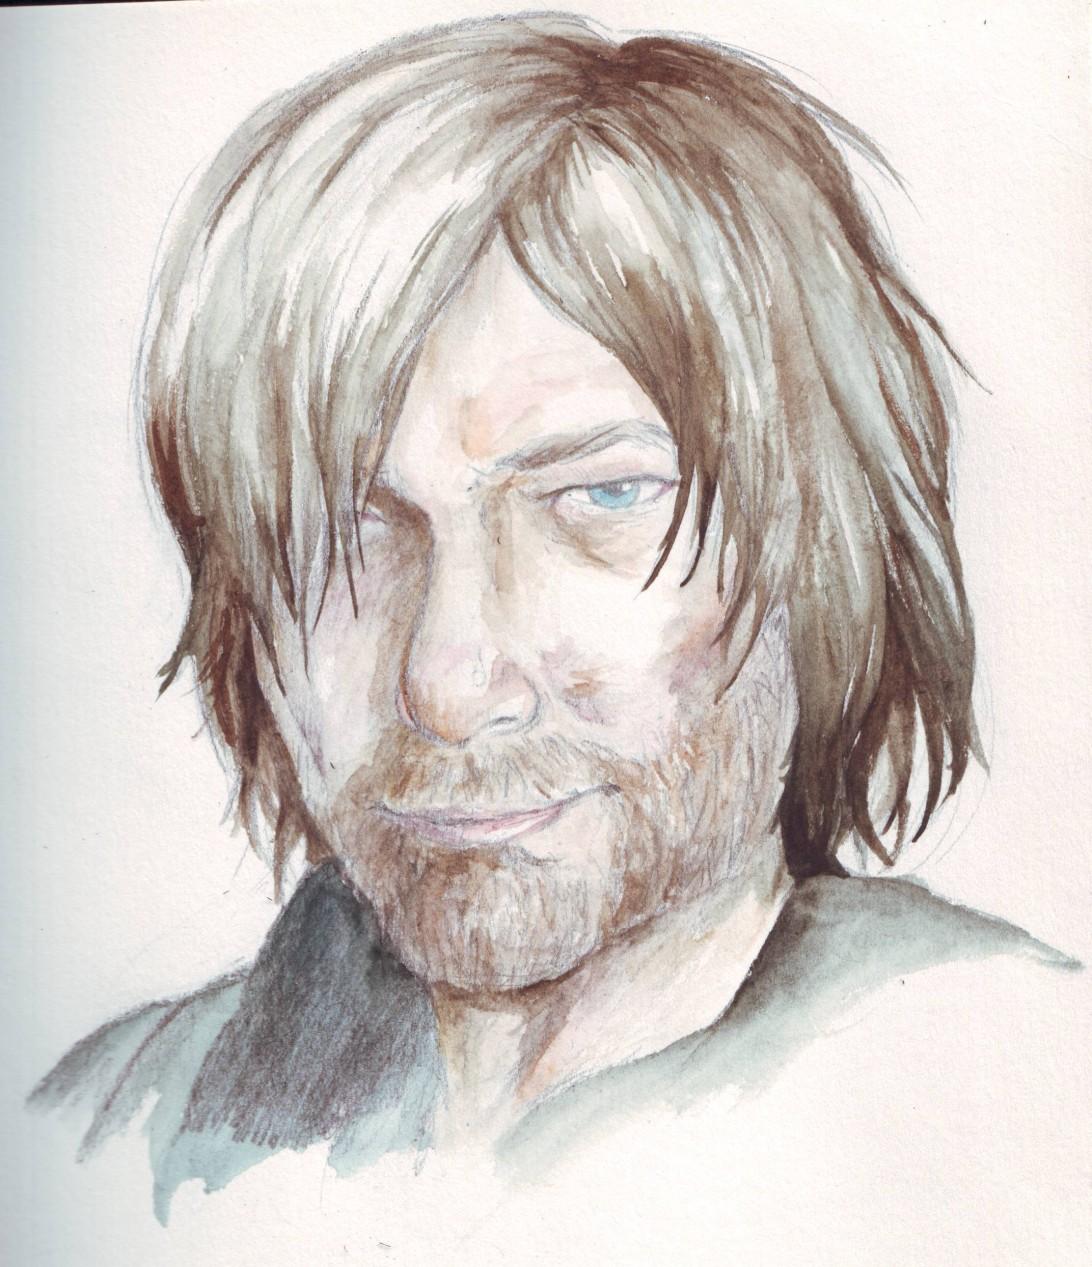 Daryl Dixon - Mancandy